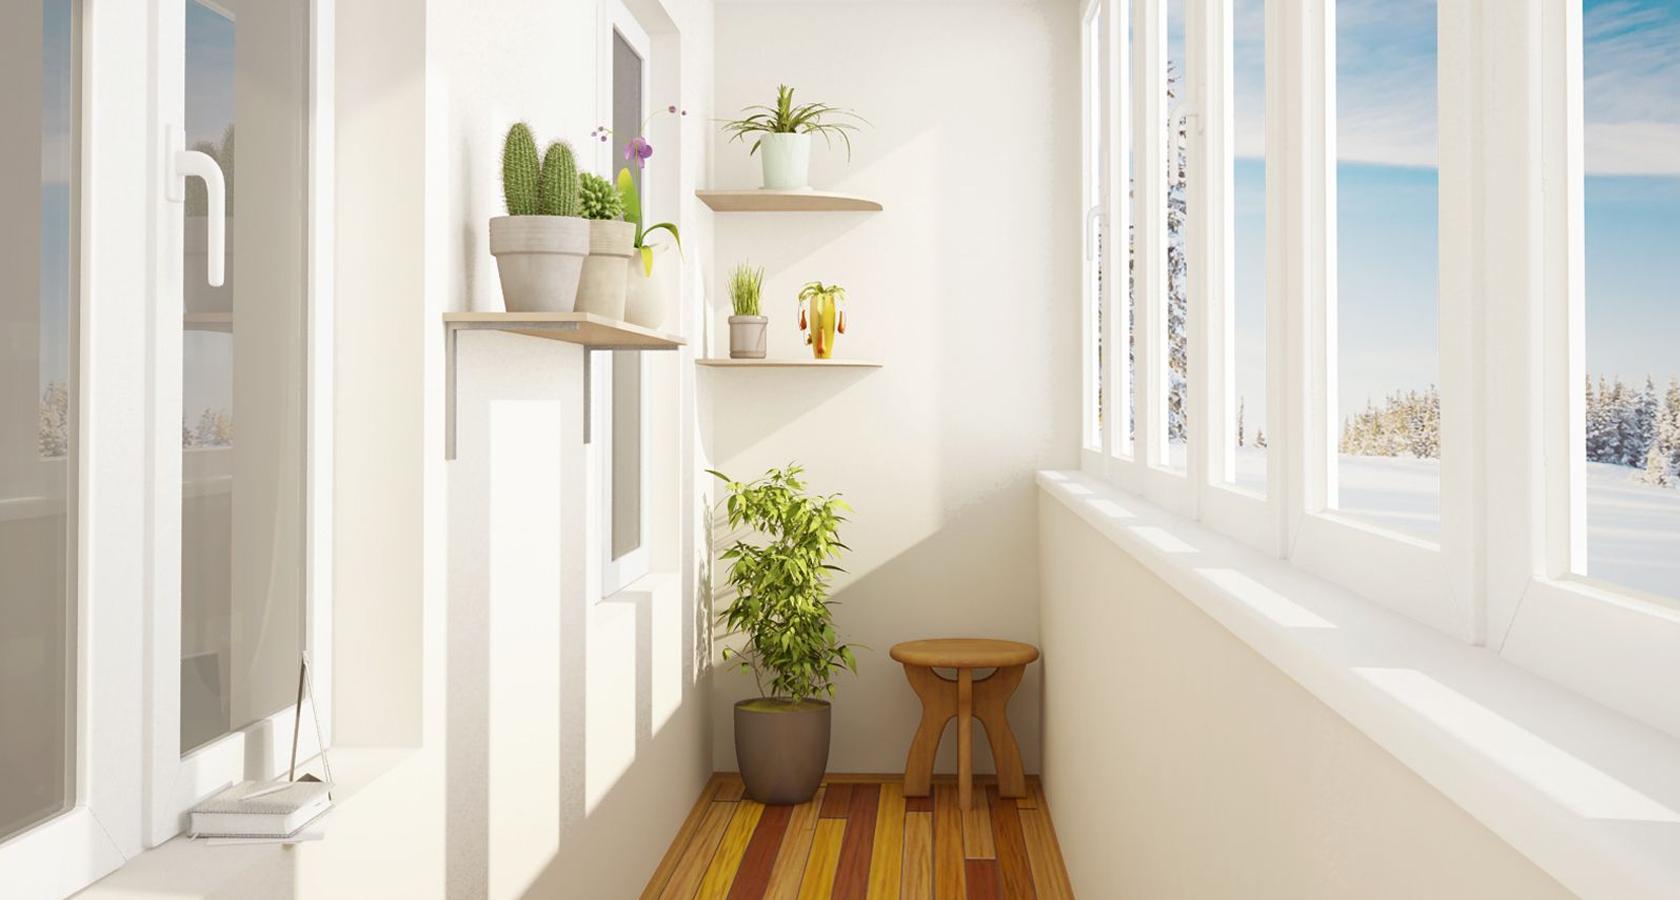 картинки балконов и лоджий внутри